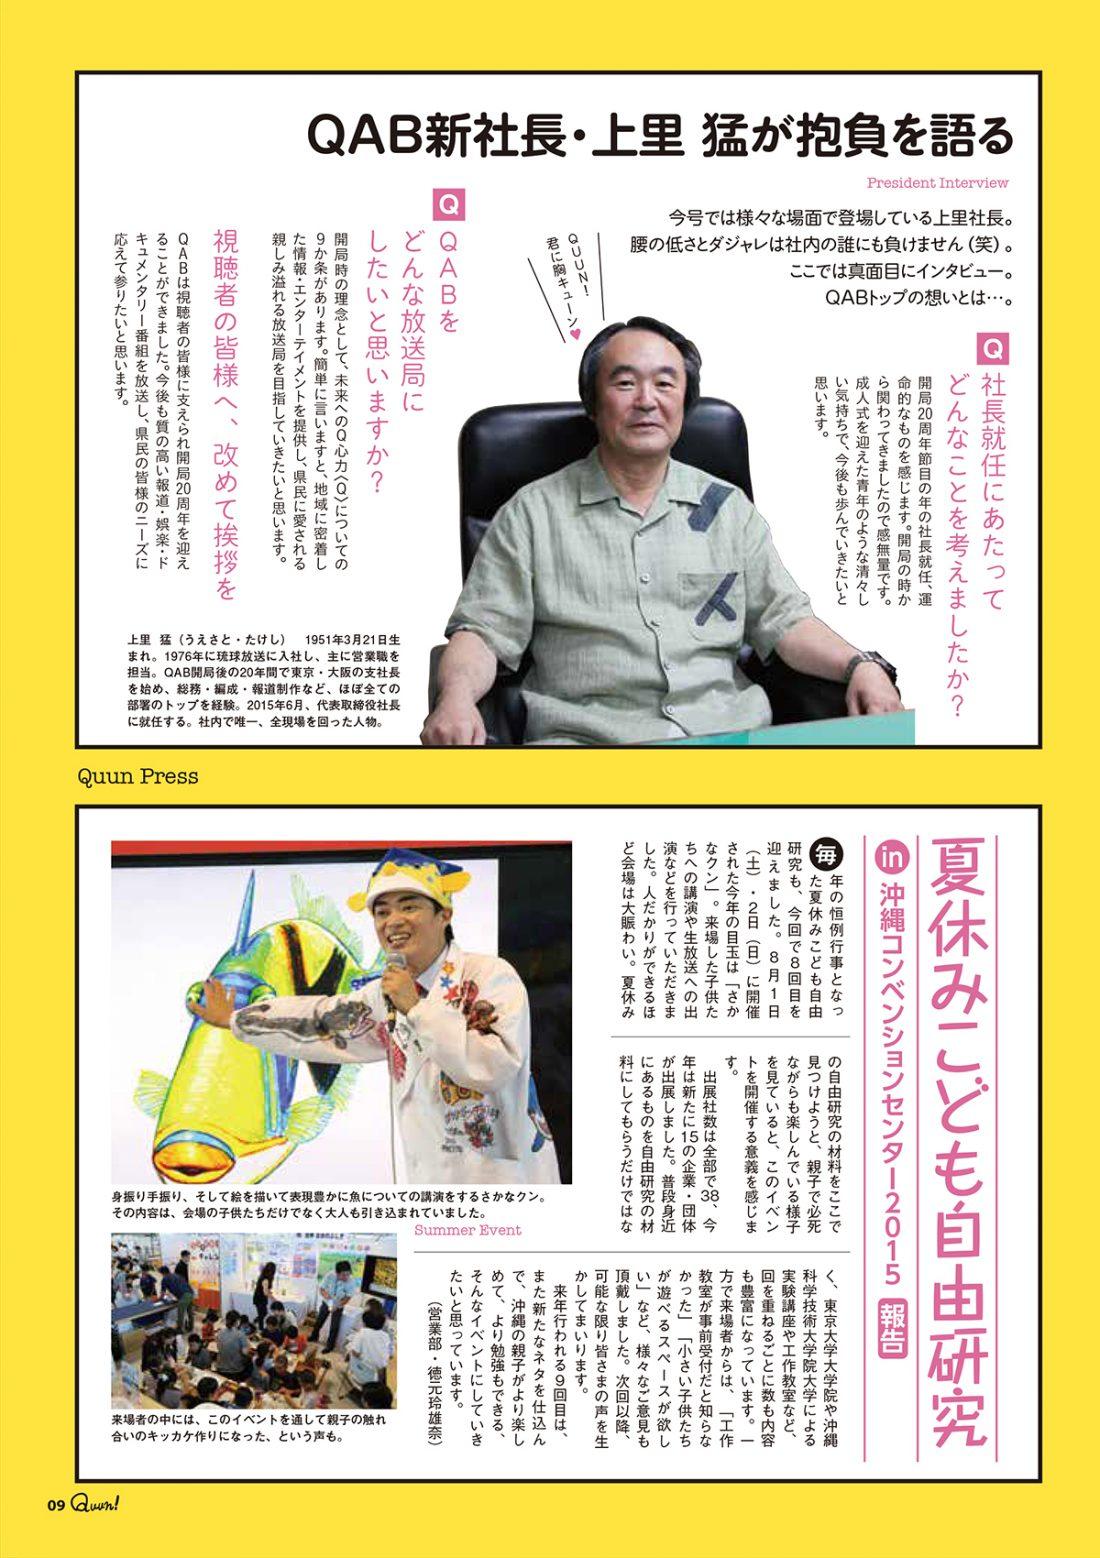 https://www.qab.co.jp/qgoro/wp-content/uploads/quun_0411-1100x1558.jpg